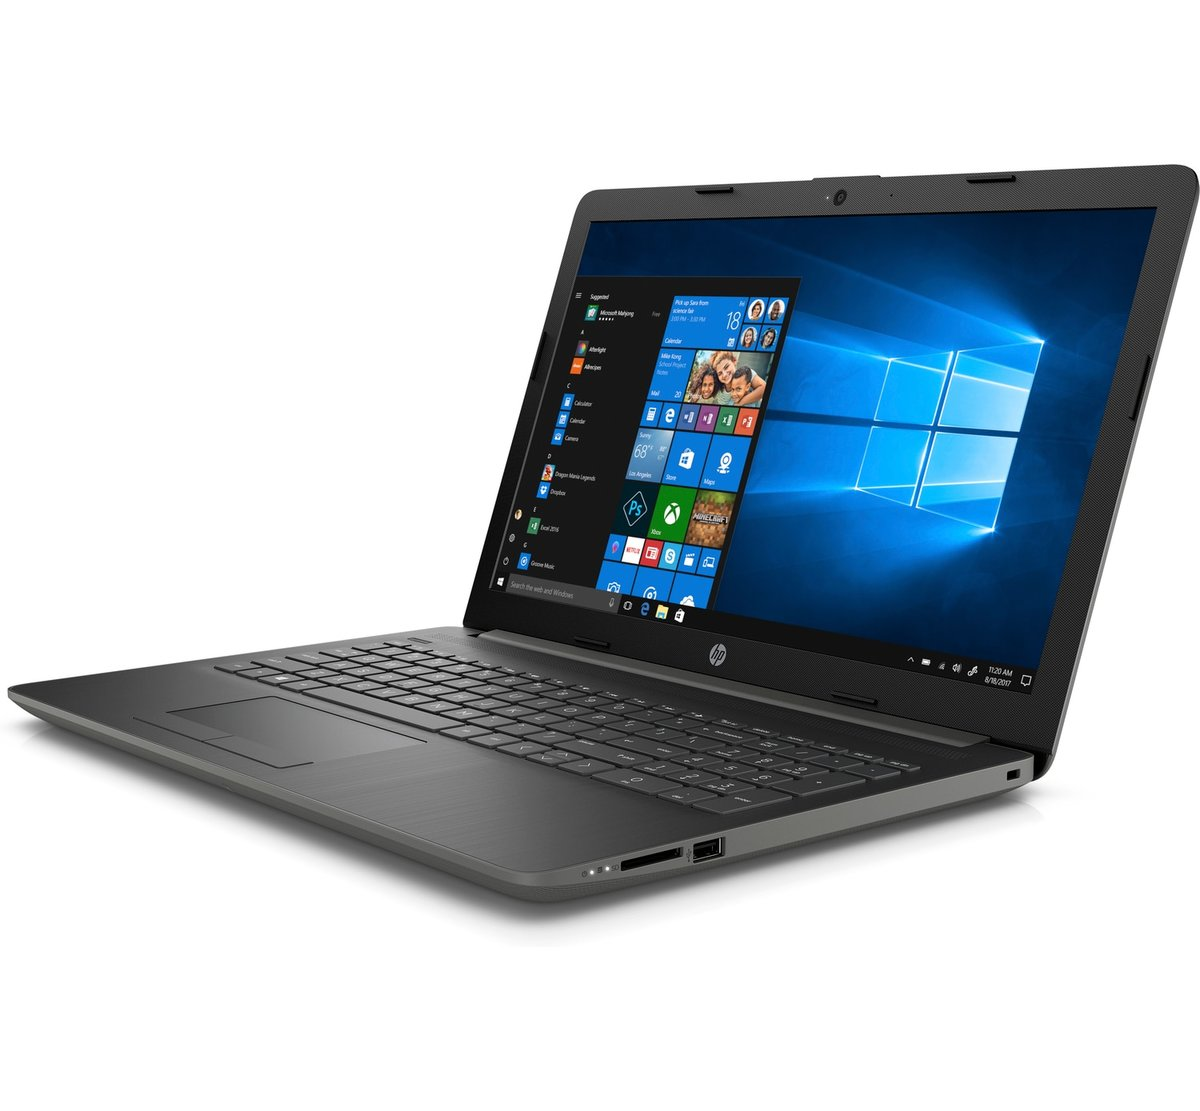 Office Depot - how to download roblox on hewlett packard laptop